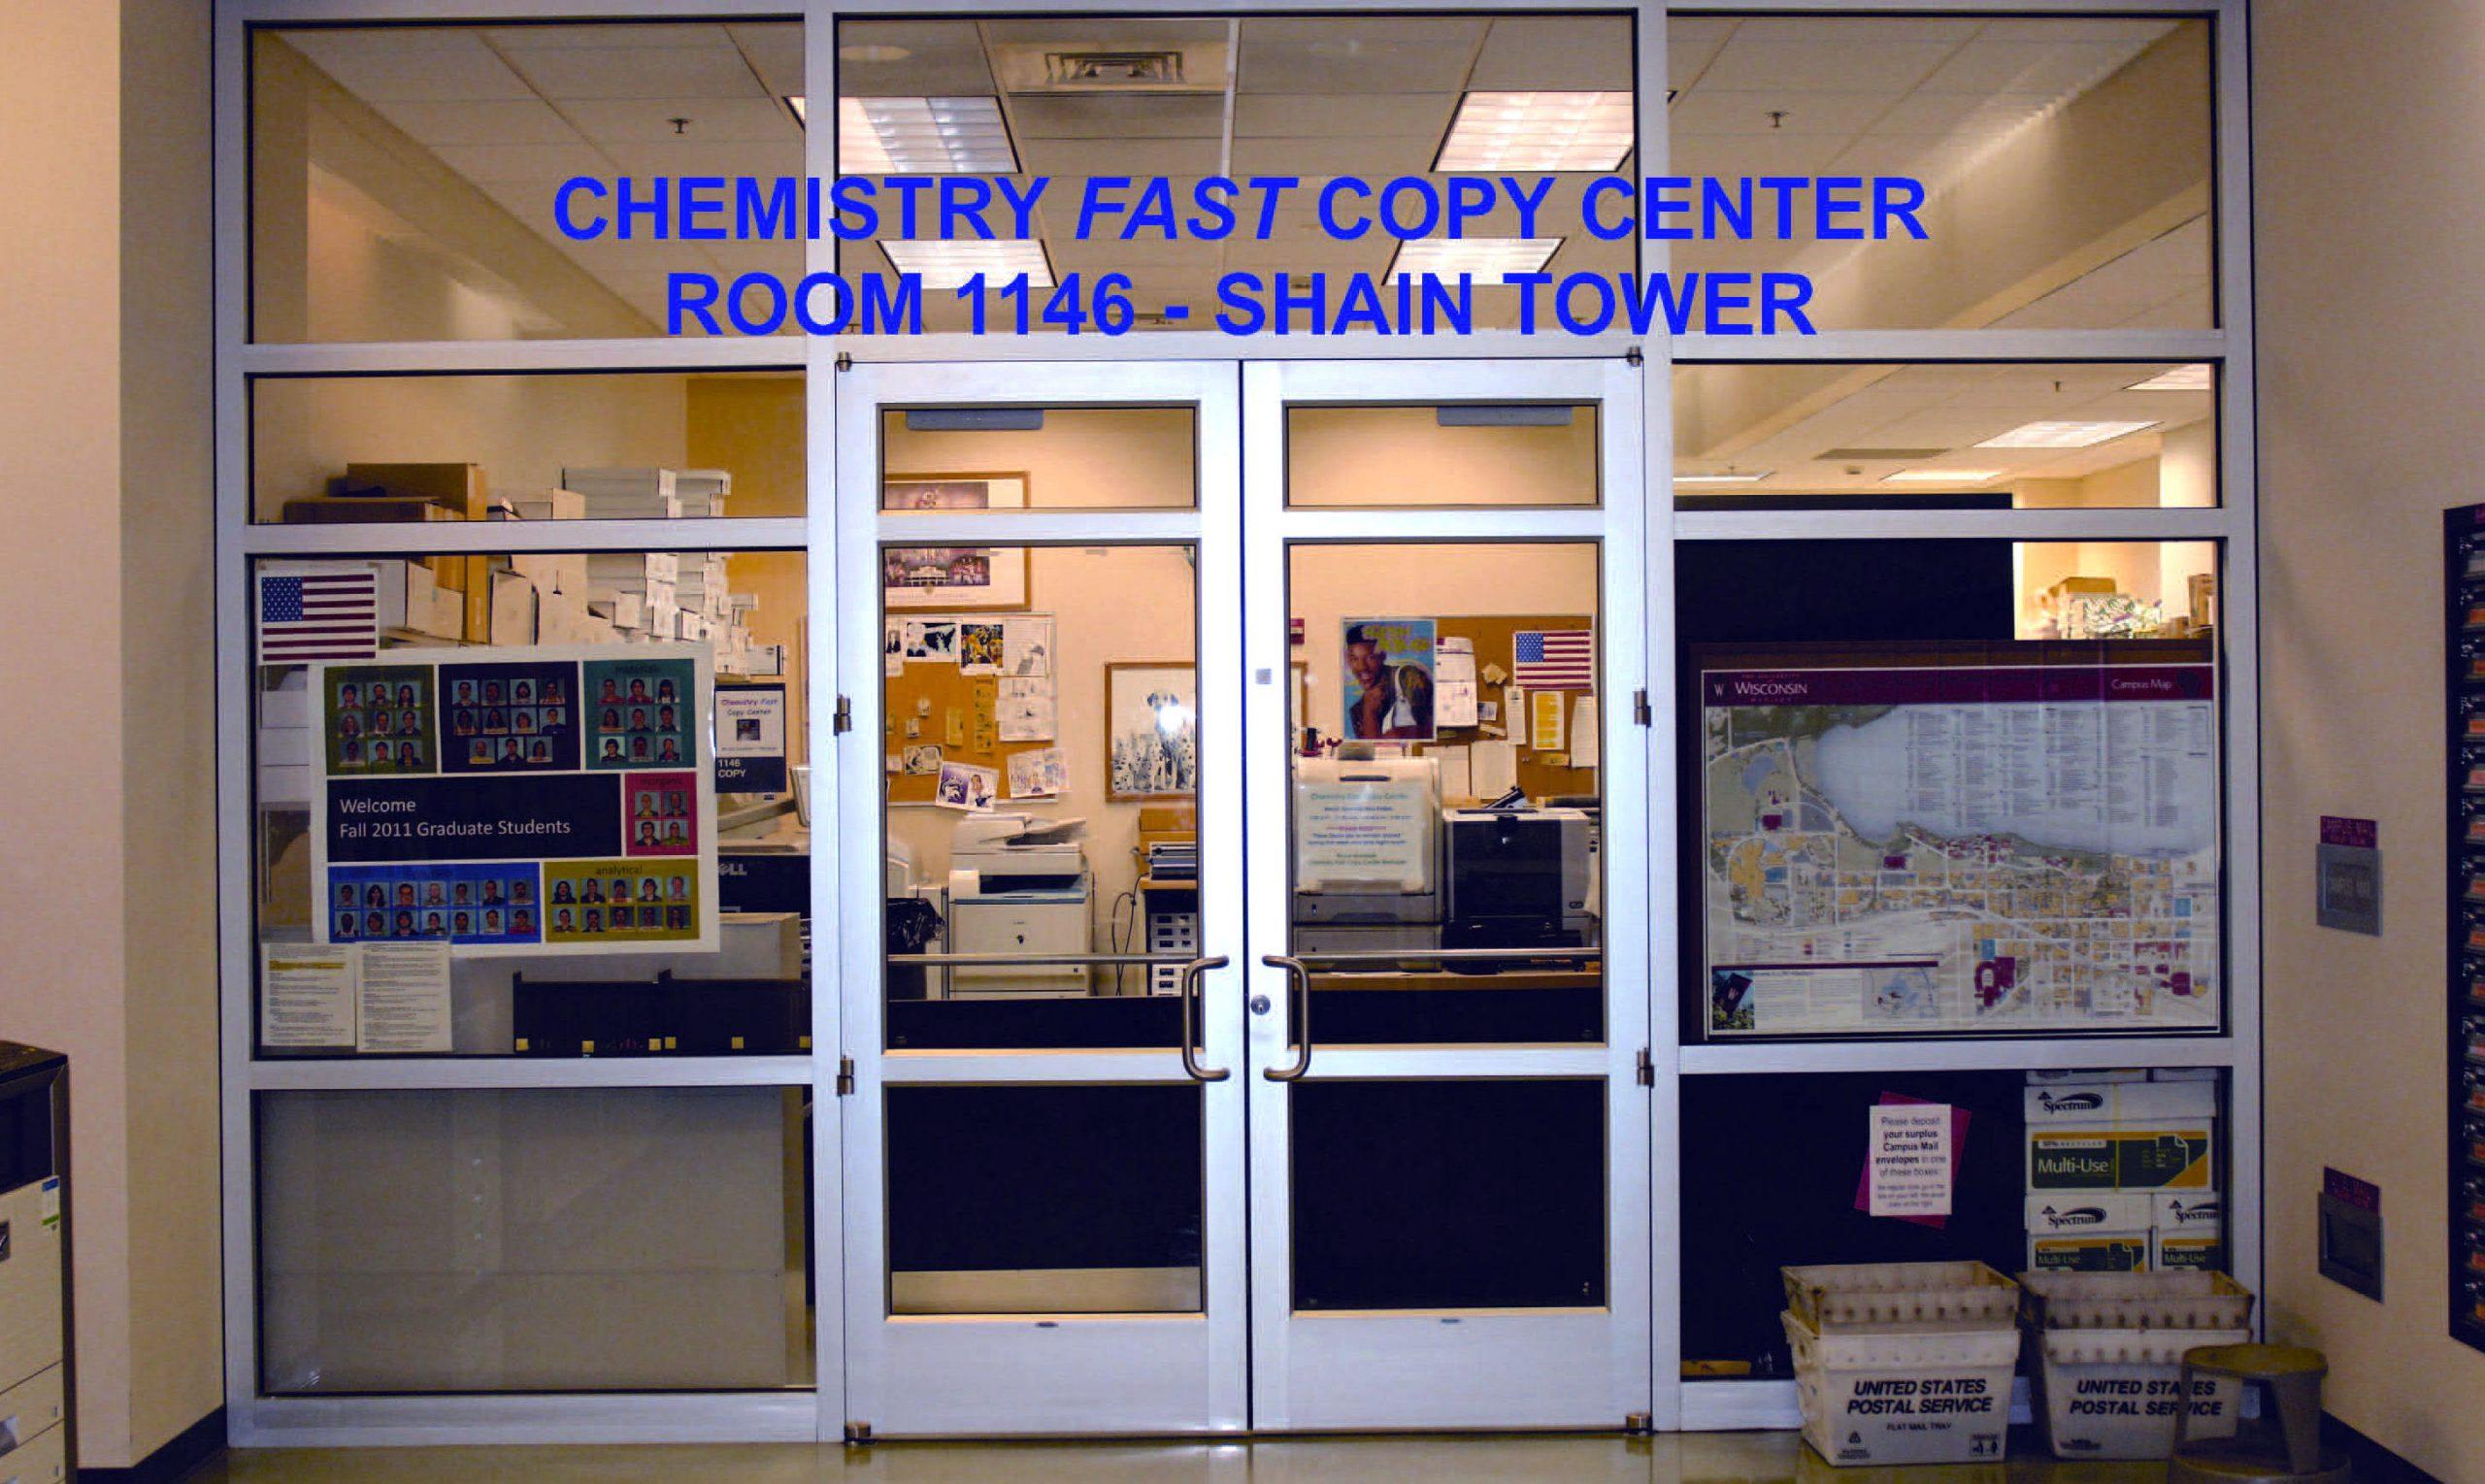 doors to chemistry copy center